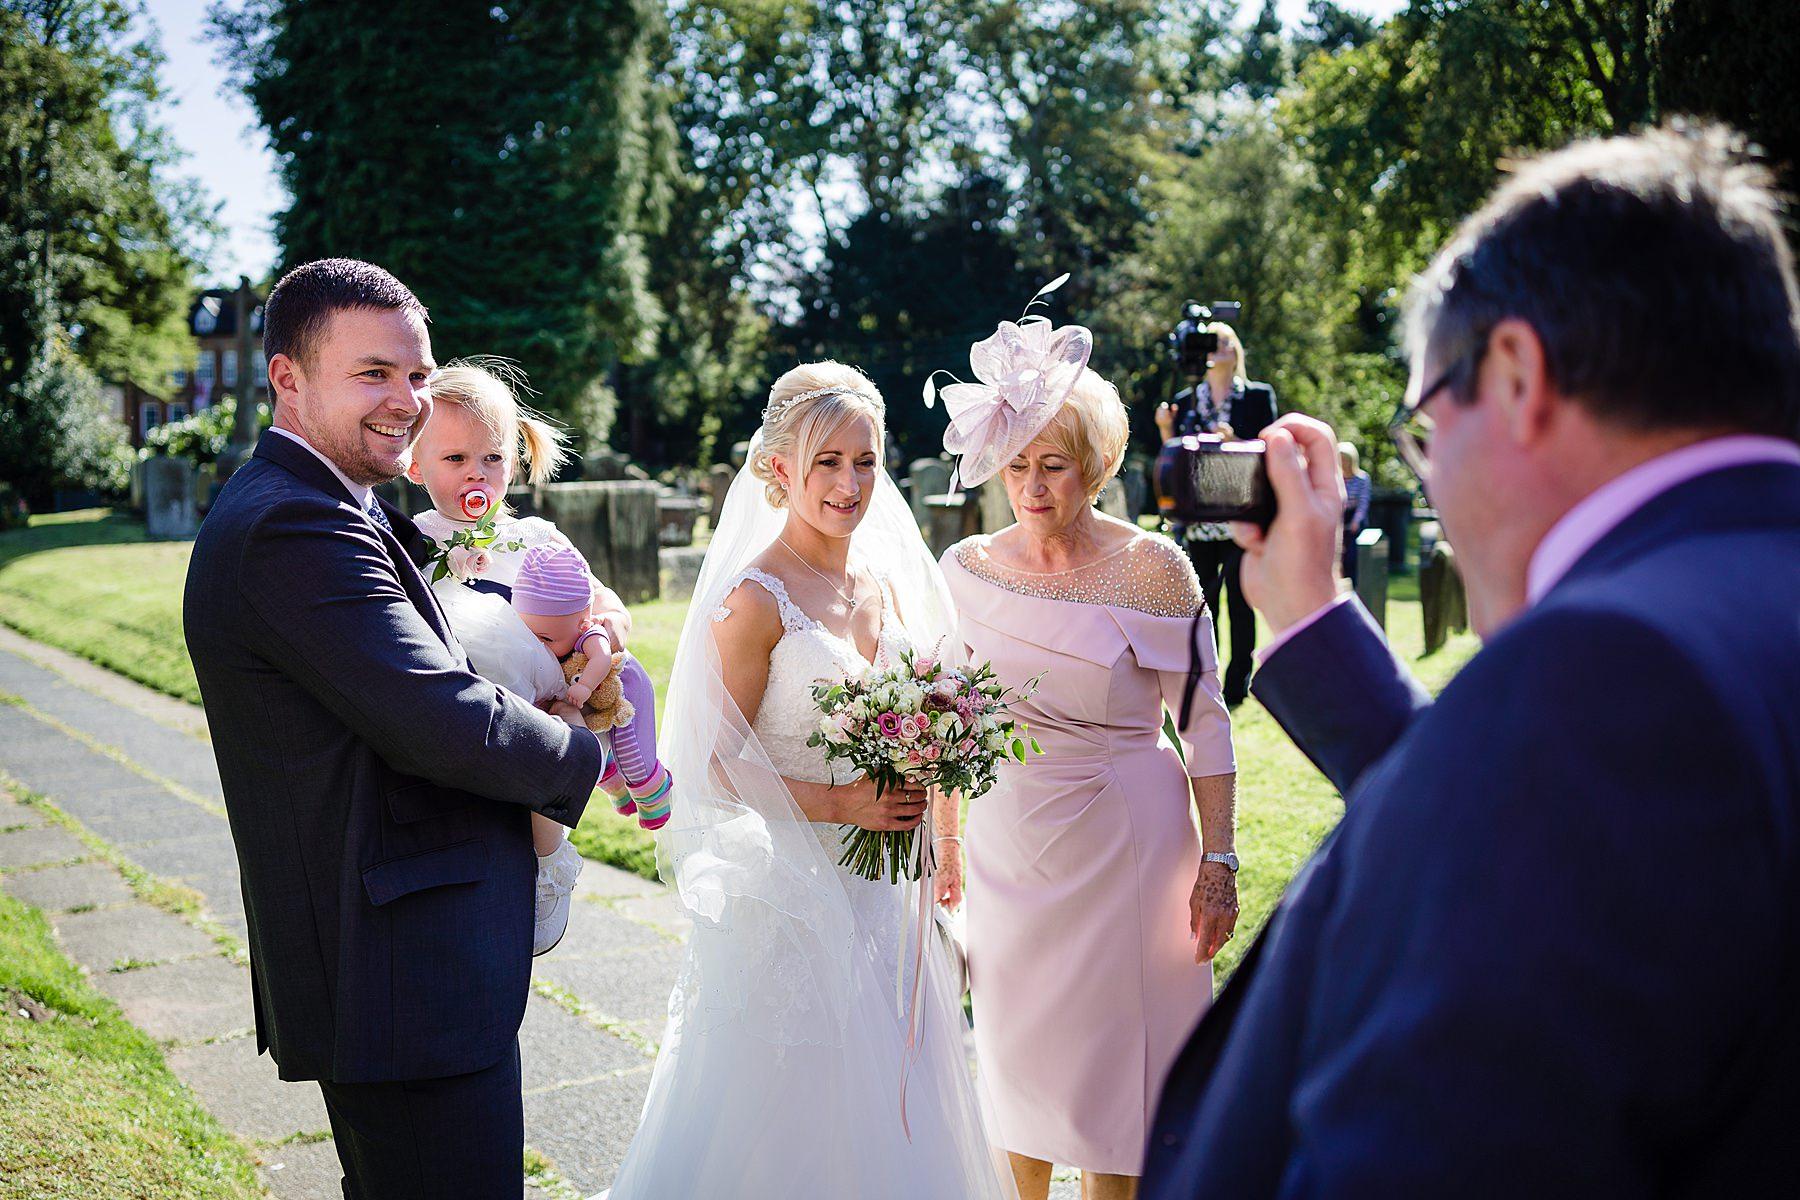 guests congratulate couple